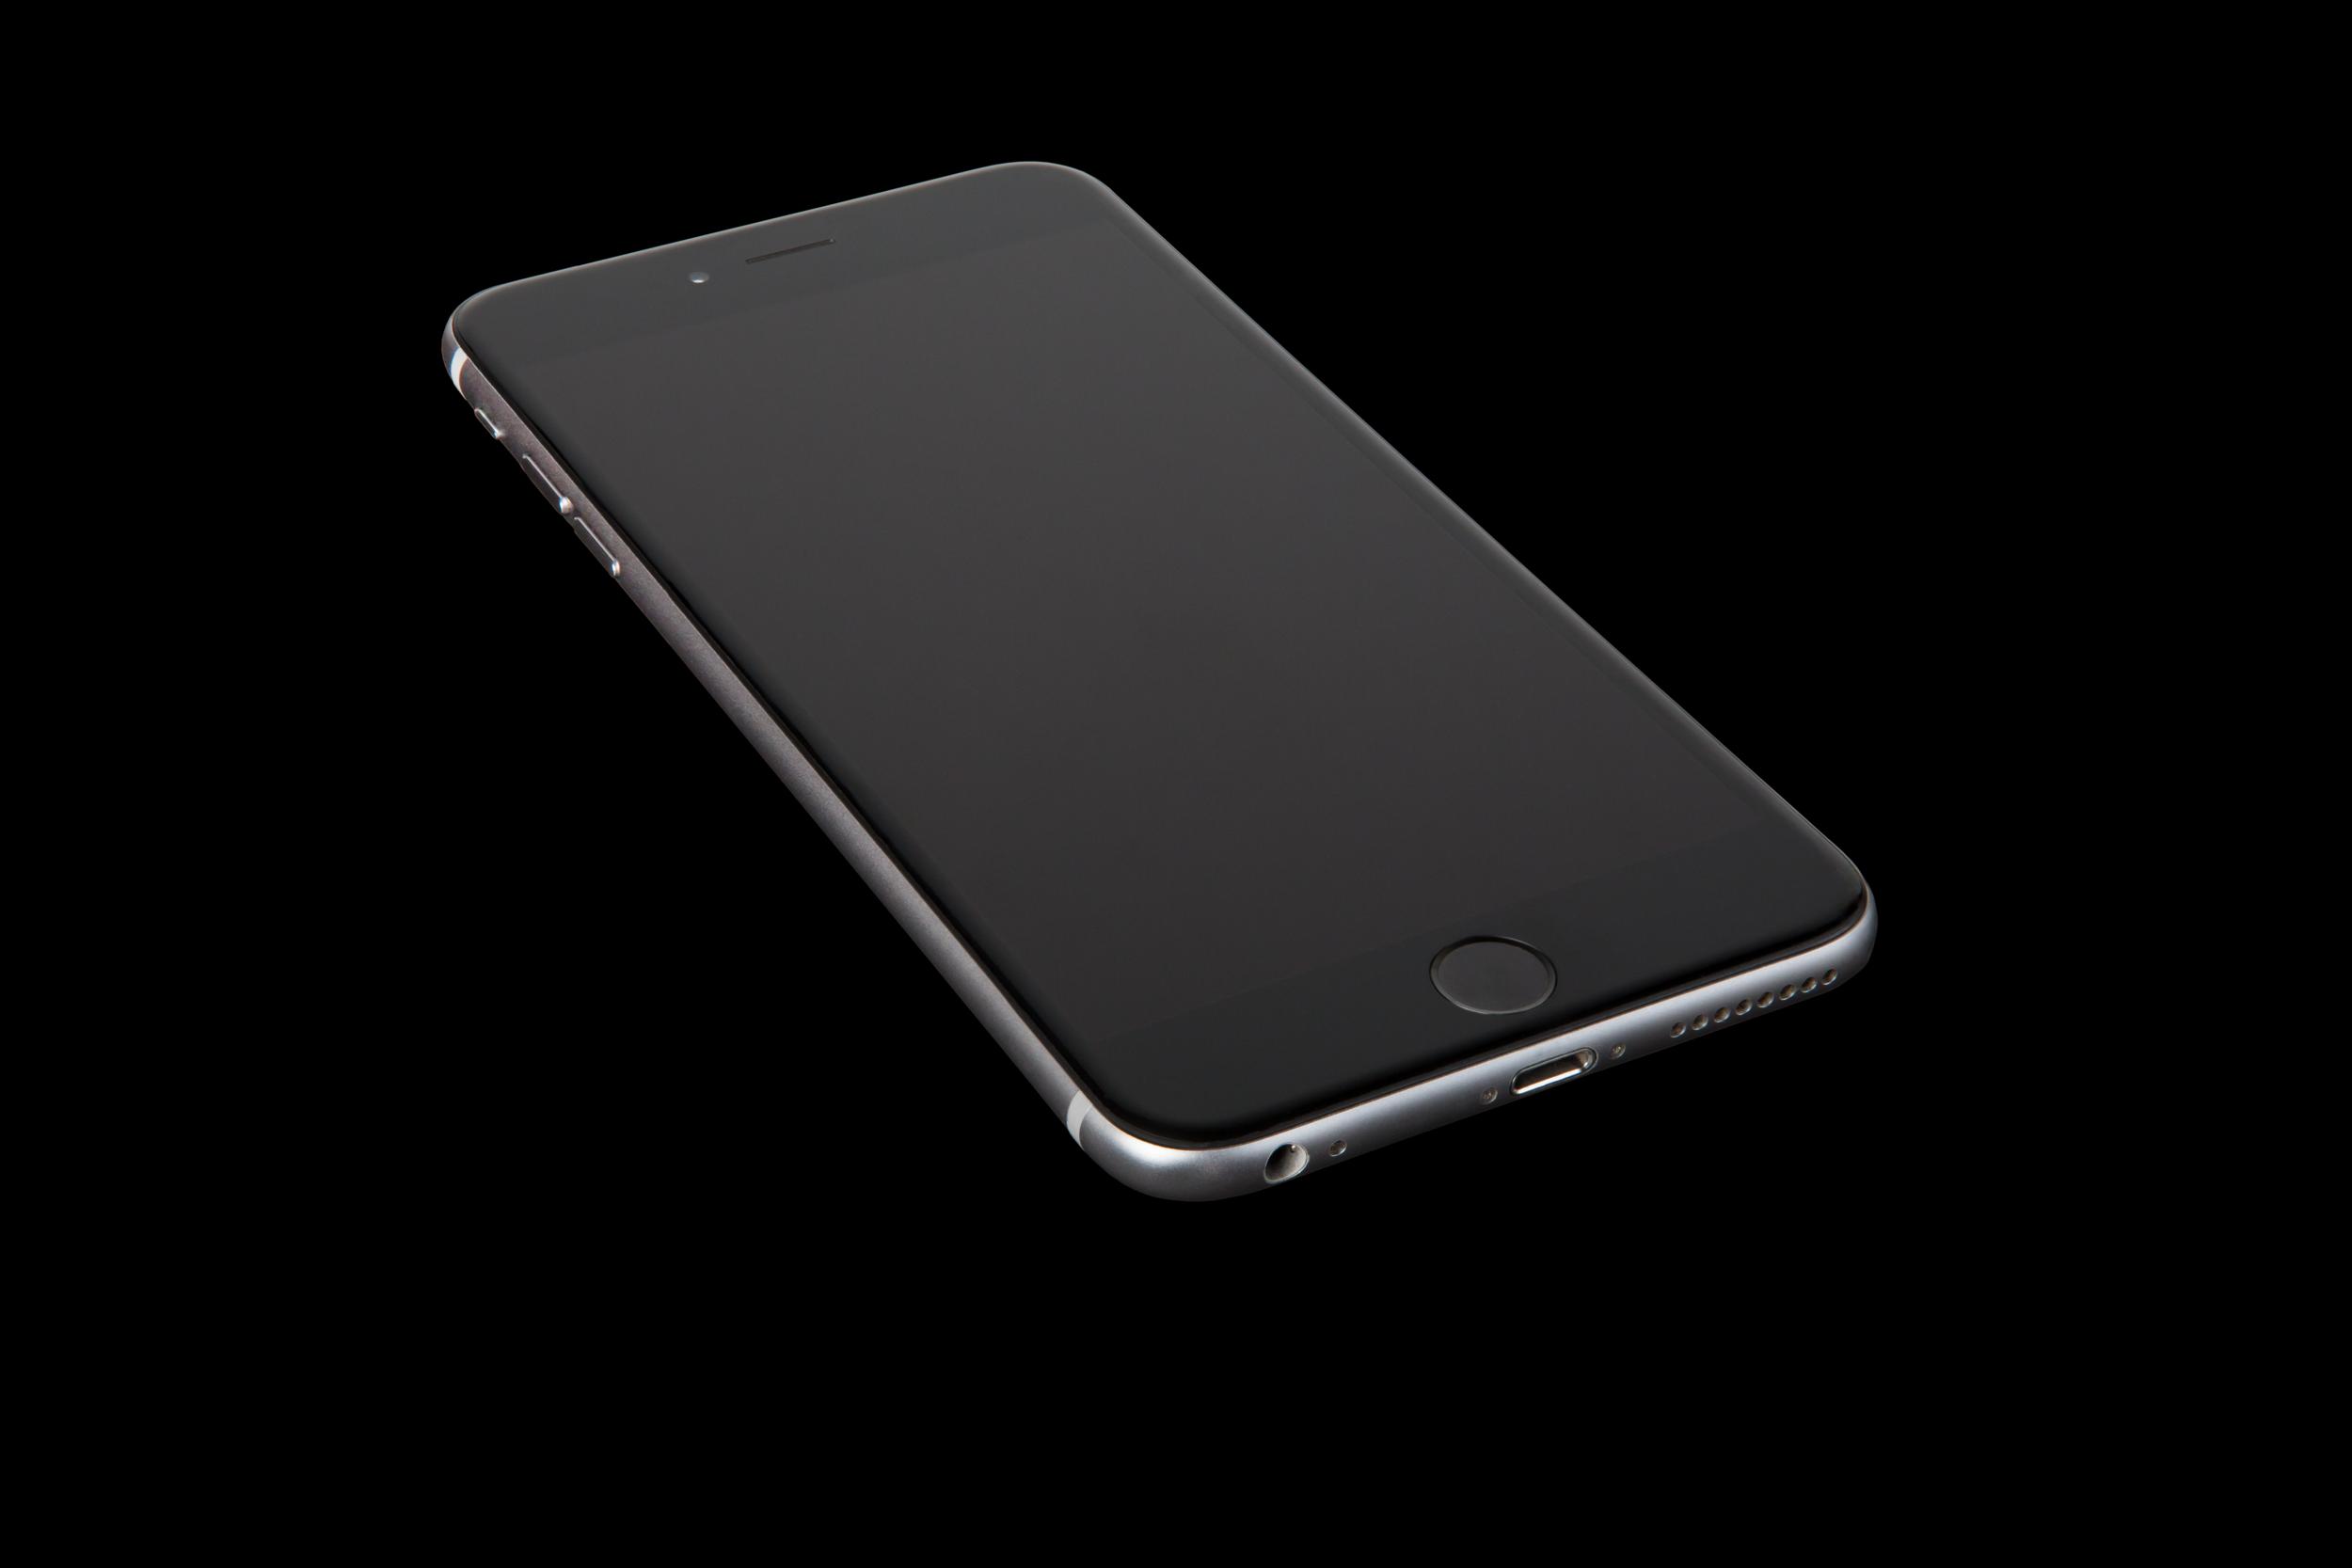 iPhone - Black Back.png